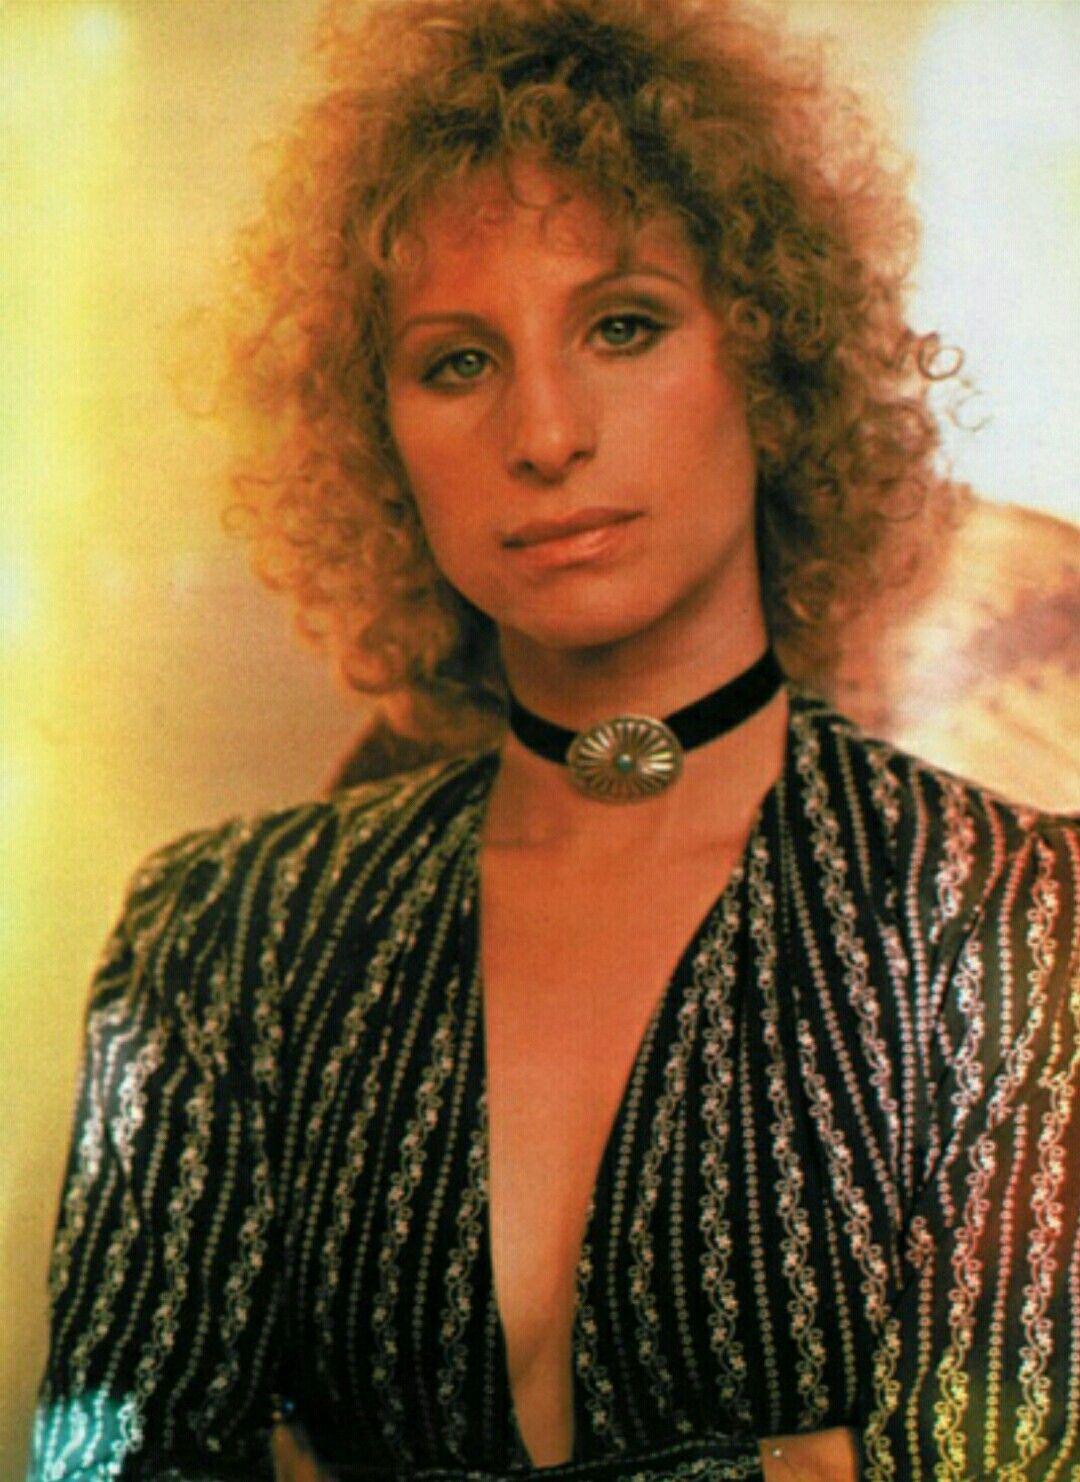 Barbra Streisand A Star Is Born Actresses Barbra Streisand